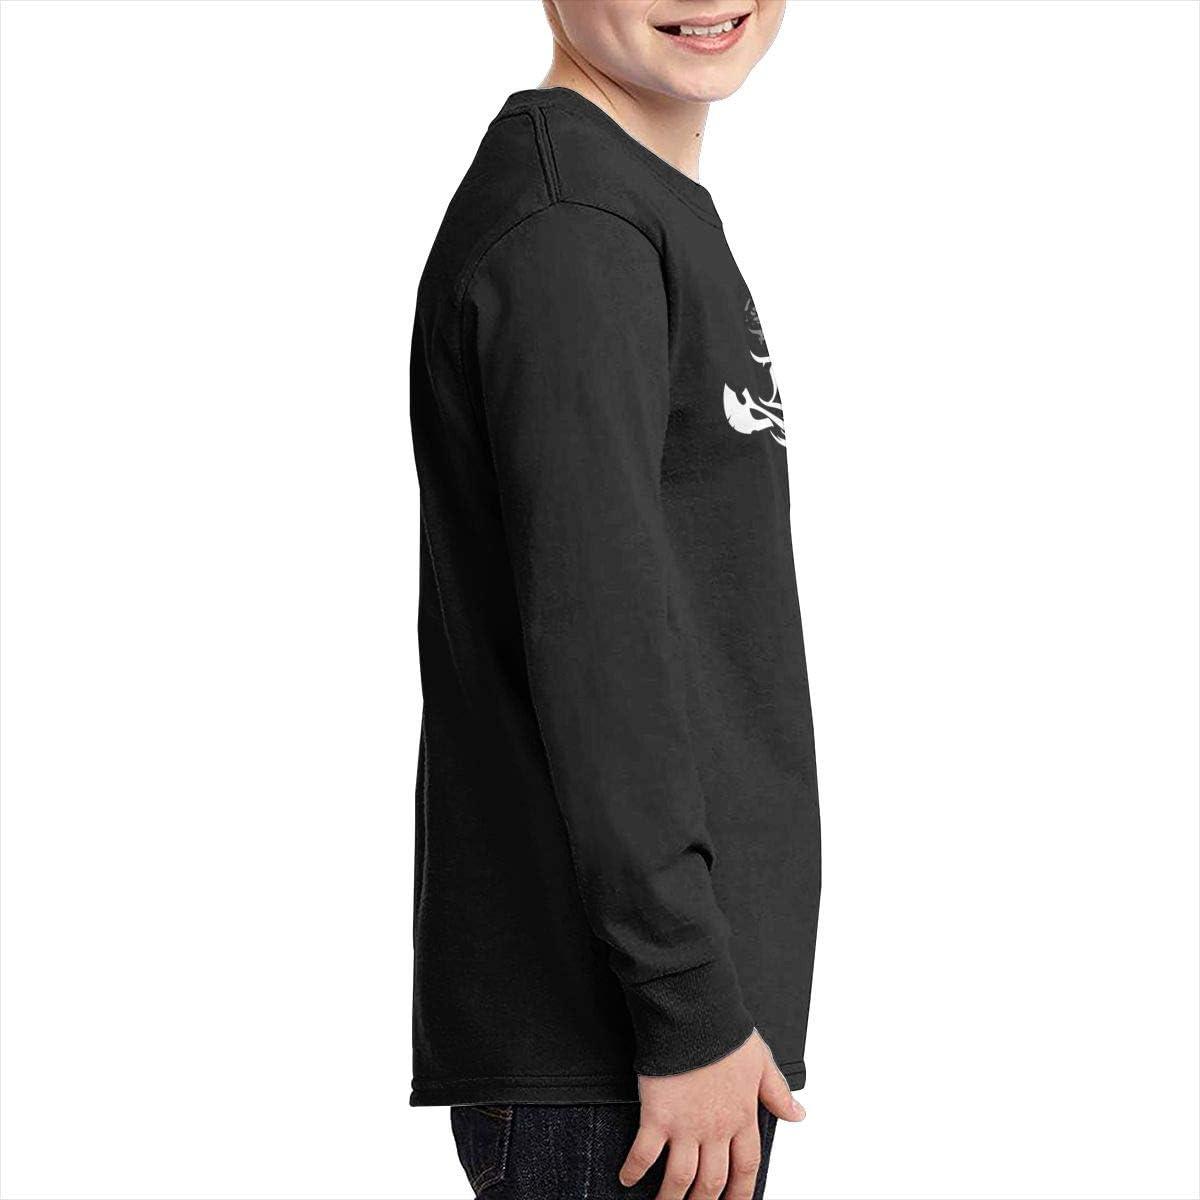 MichaelHazzard Dethklok Youth Wearable Long Sleeve Crewneck Tee T-Shirt for Boys and Girls